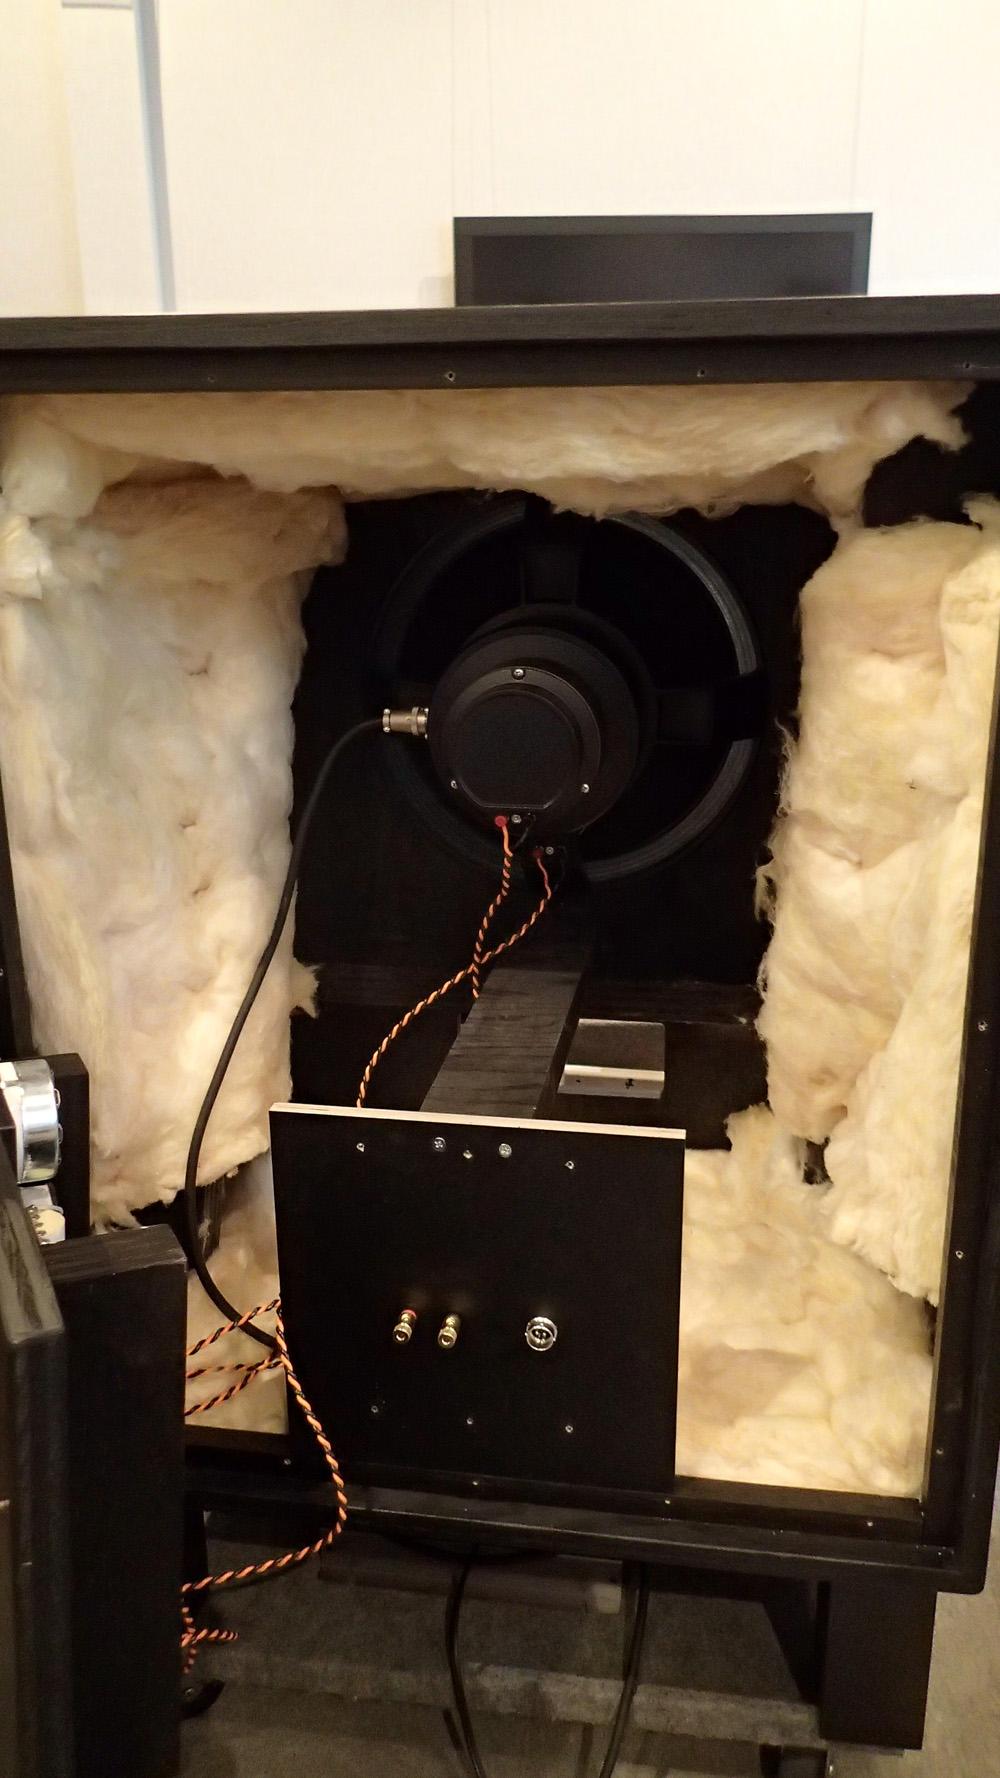 38cm同軸2WAY 励磁型システム 完成しました。_b0262449_21554531.jpg